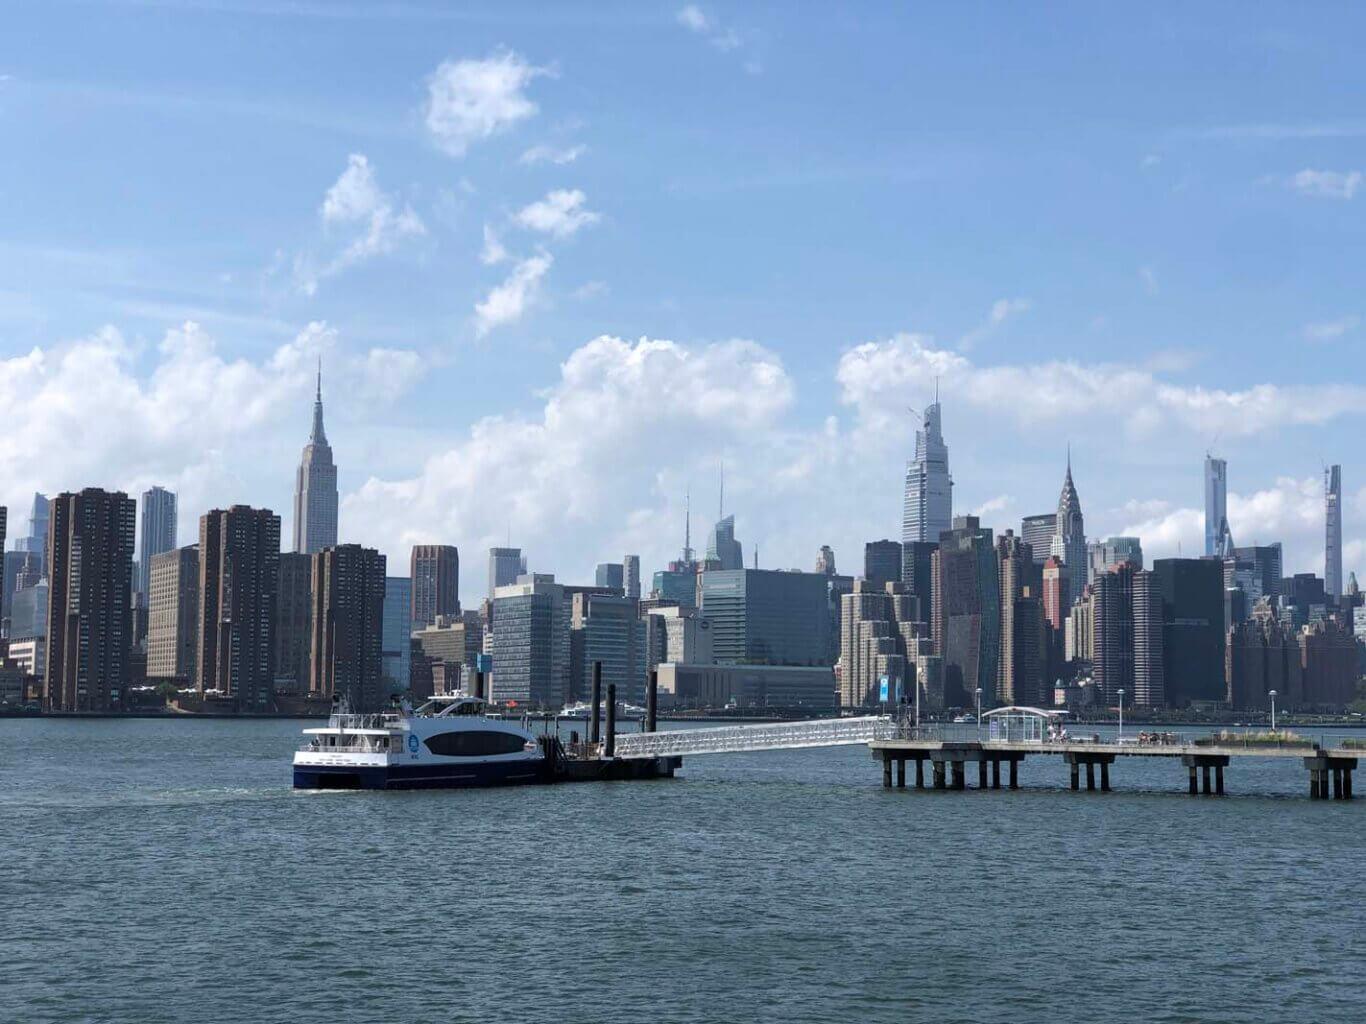 NY Ferry in Greenpoint Brooklyn